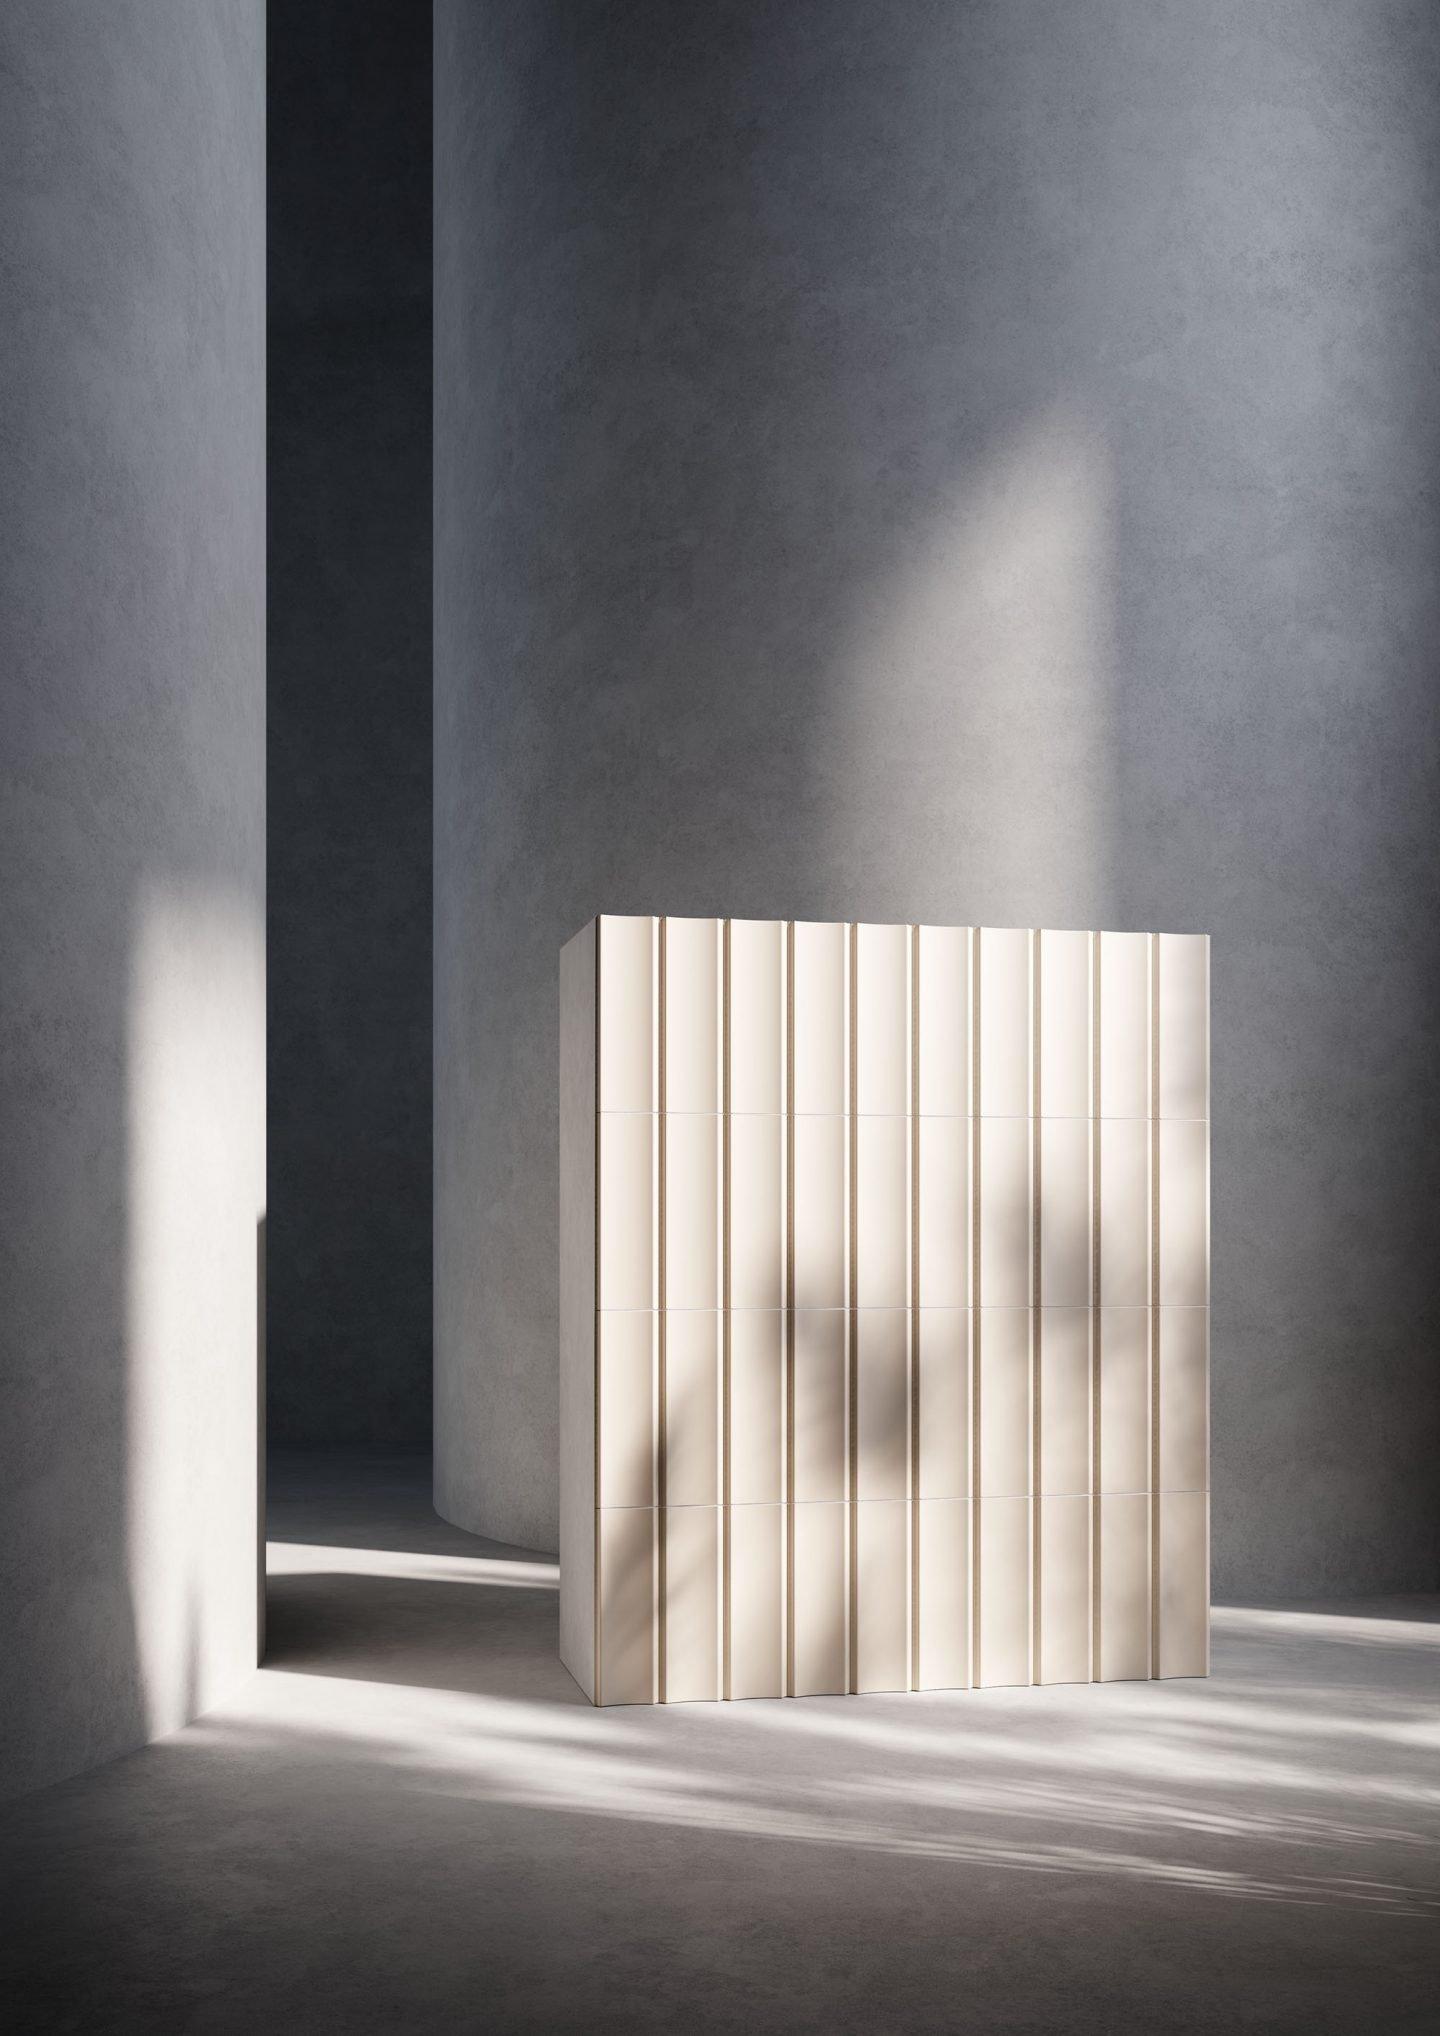 IGNANT-Design-MUTStudio-3D-Massimo-Colonna-Bow-Harmony